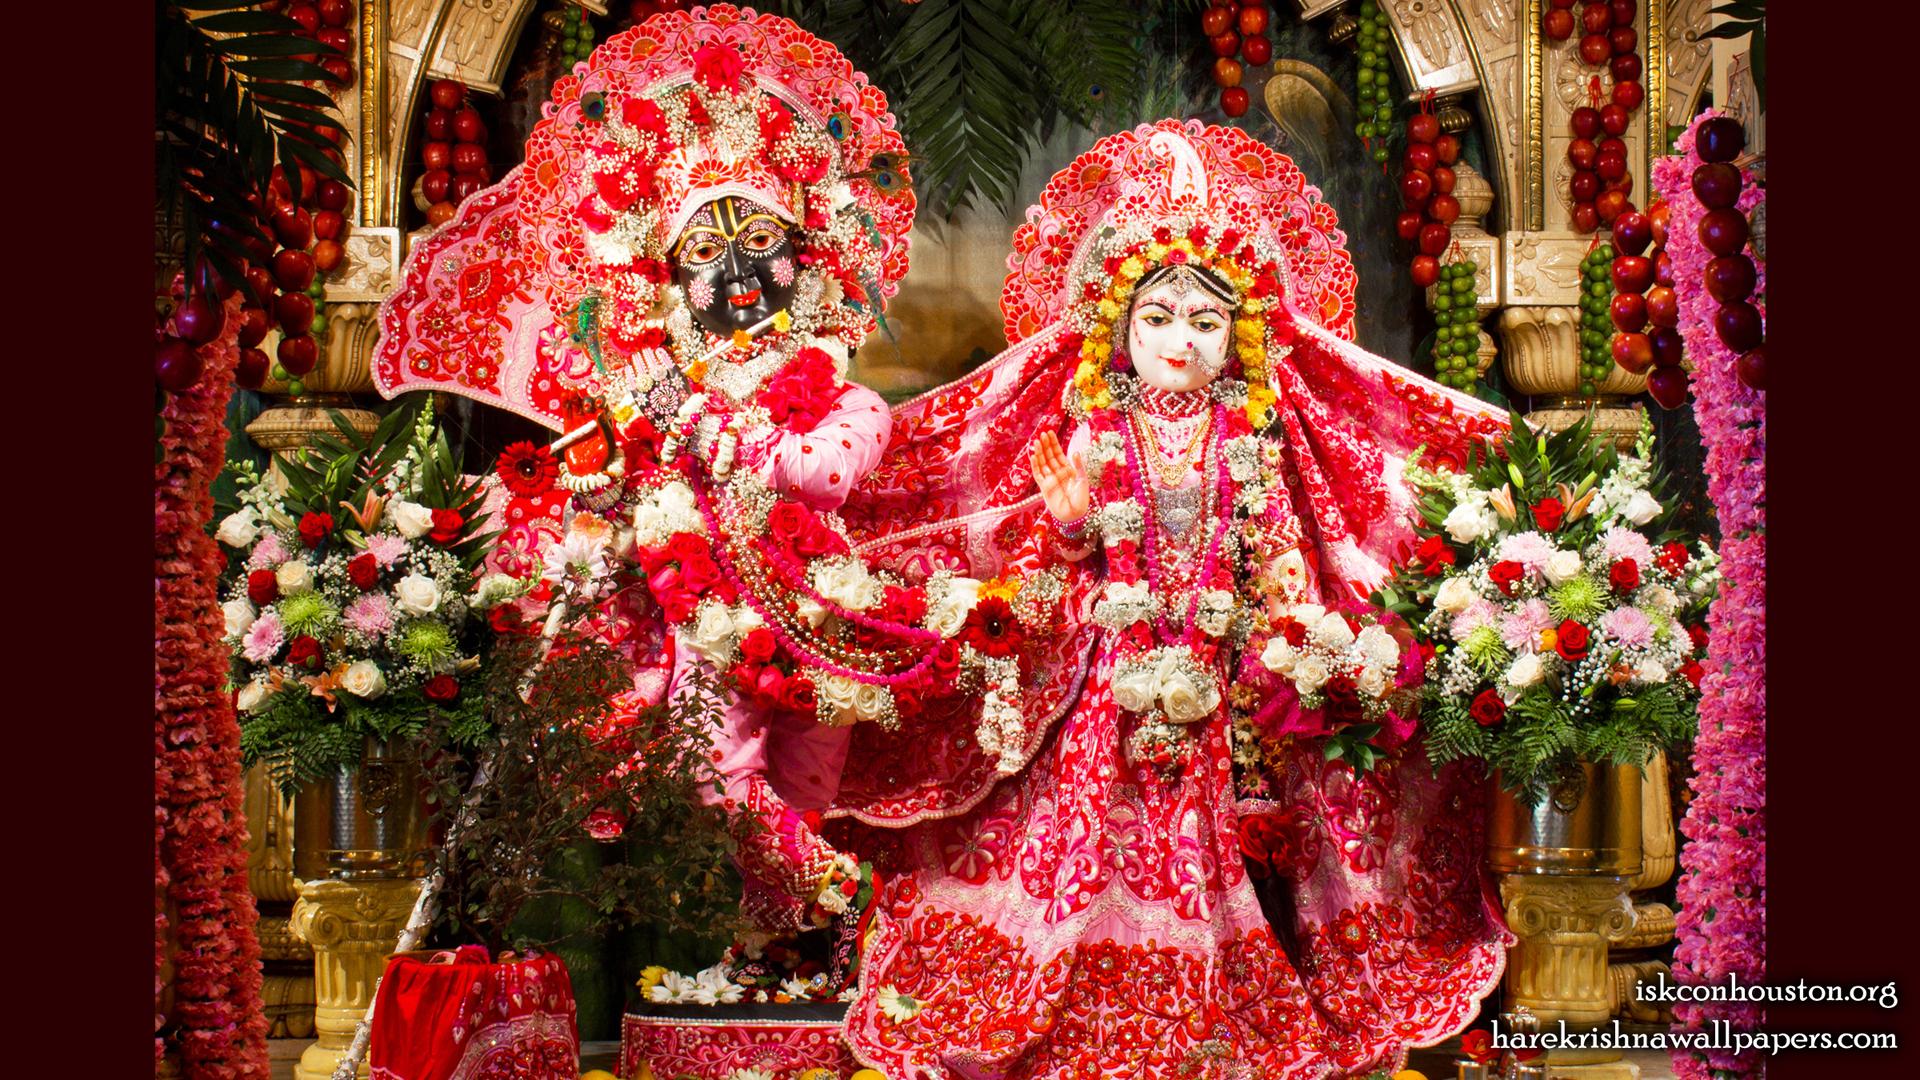 Sri Sri Radha Nilamadhava Wallpaper (011) Size 1920x1080 Download